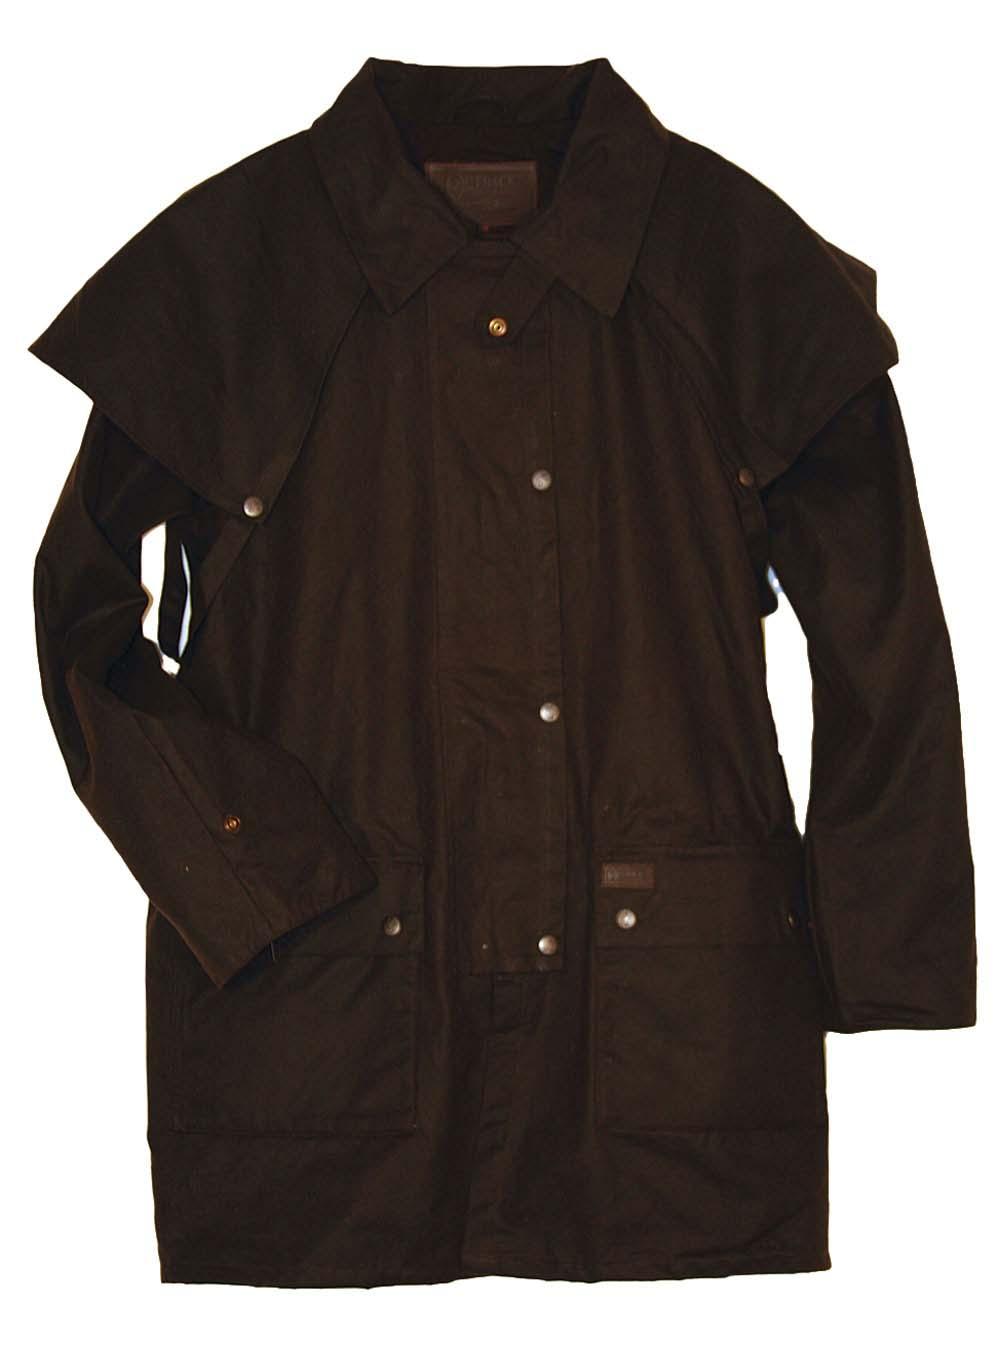 Outback Bush Rangeer Short Oilskin Jacket